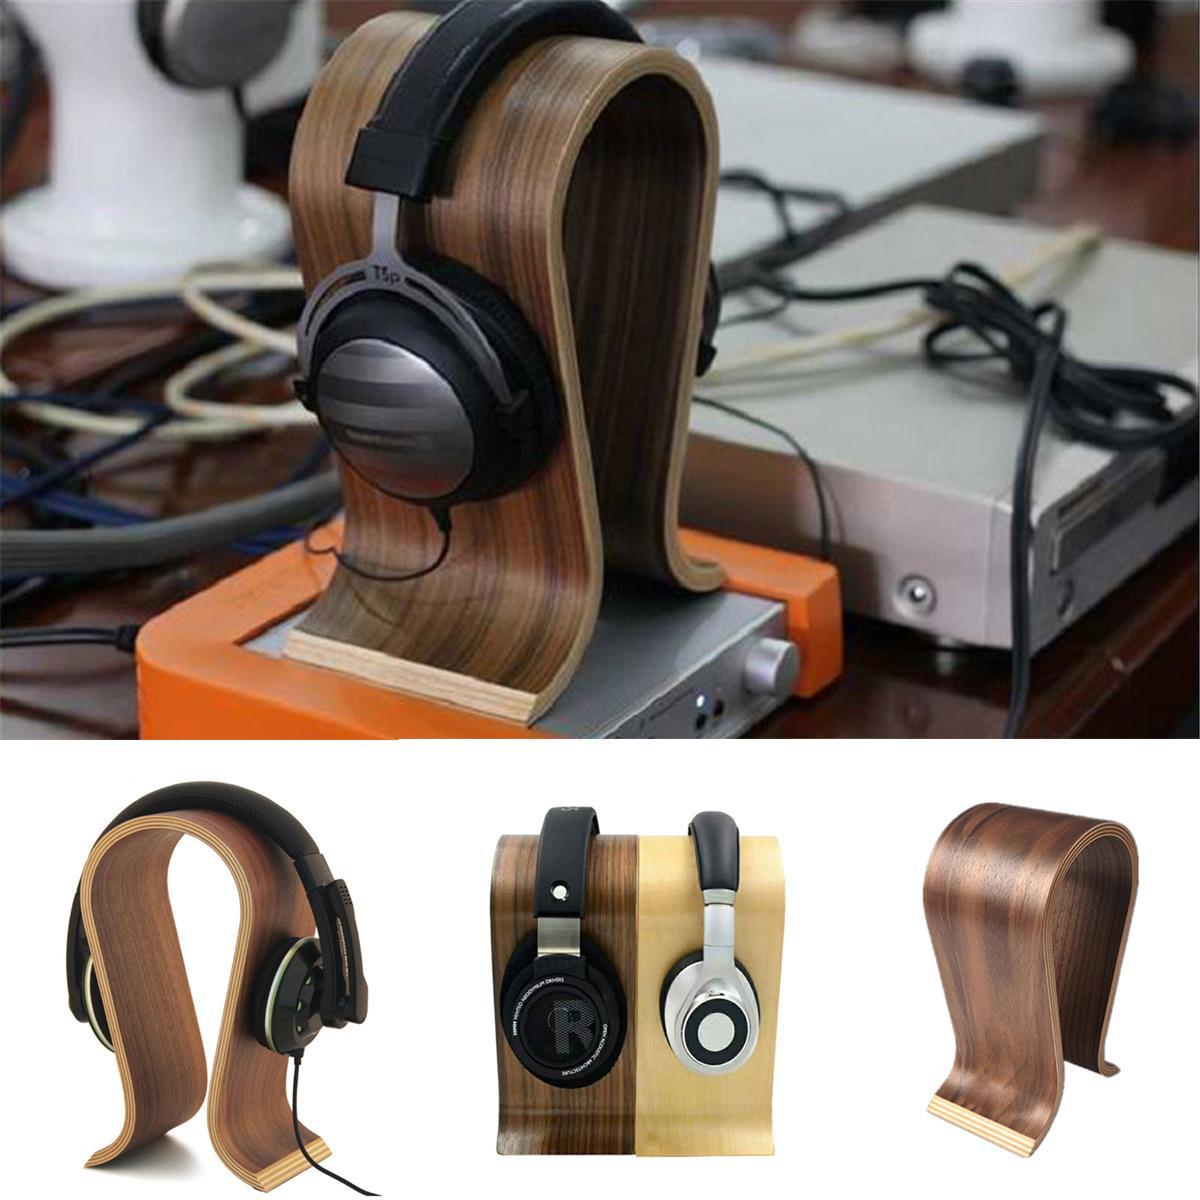 2 Colors Universal U Shape Wood Headphone Stand Earphone Hanger Display Shelf Rack Bracket Desk Portable Earphone Accessories